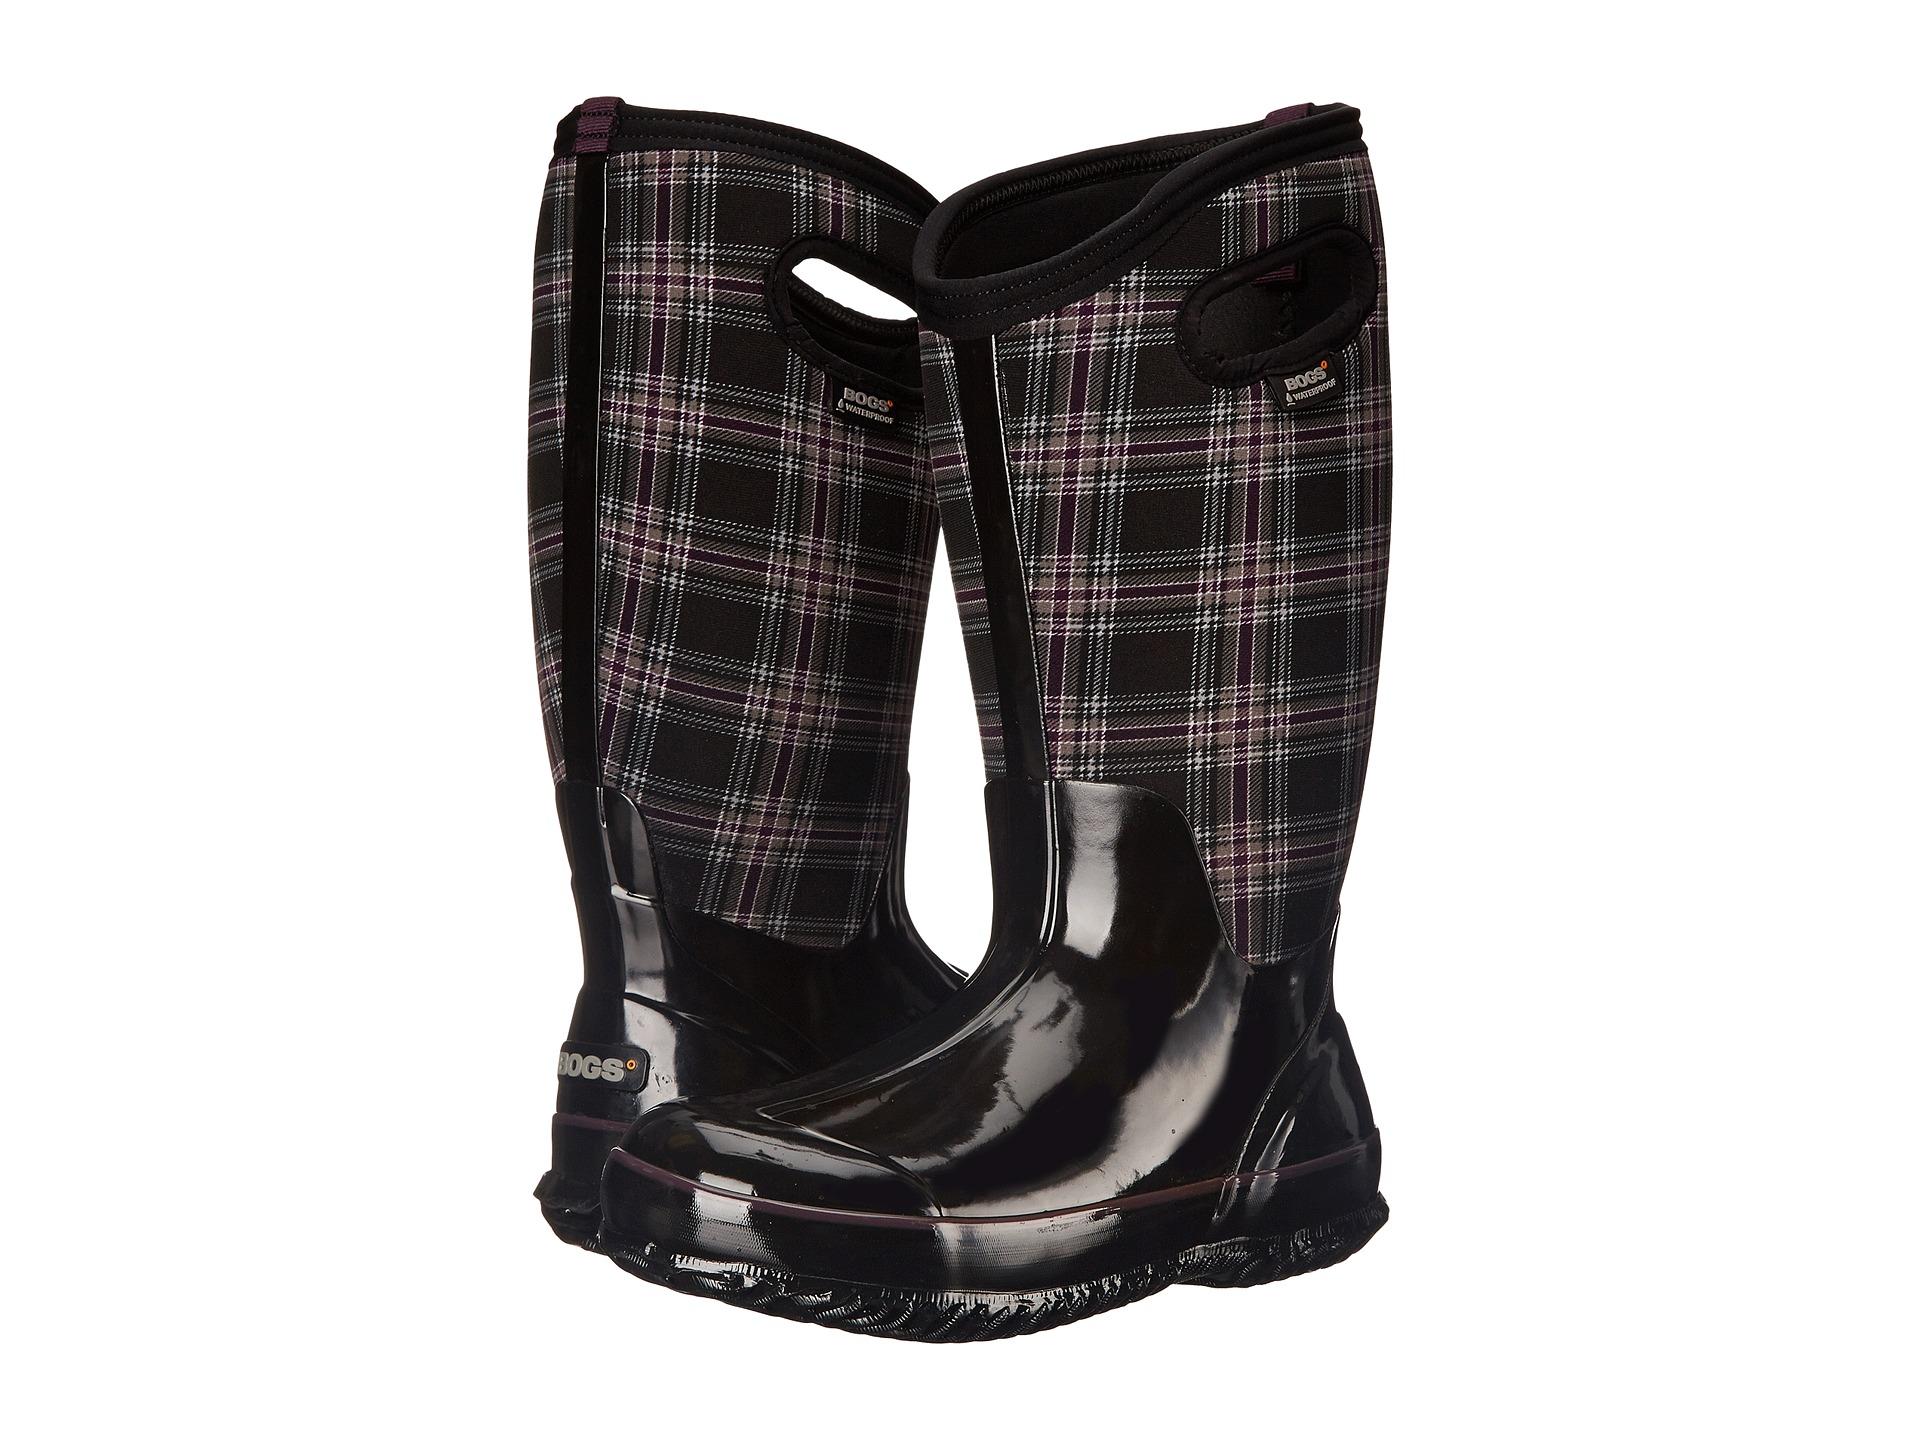 Bogs Classic Winter Plaid Tall Wide Calf Boot - Zappos.com